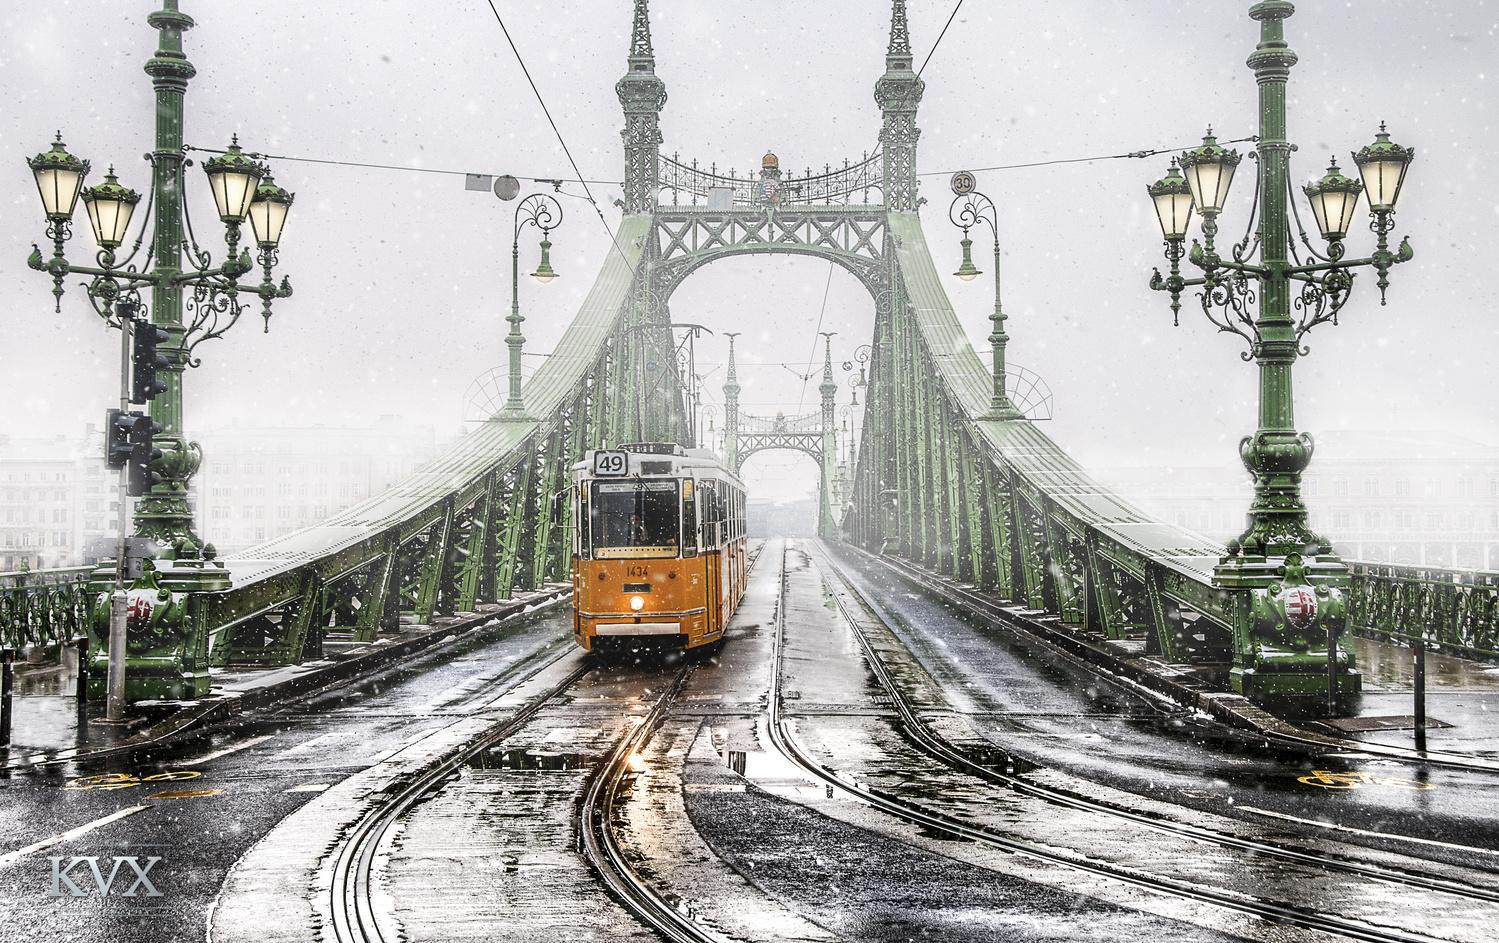 Creamy Liberty Bridge by Gellert Kovacs